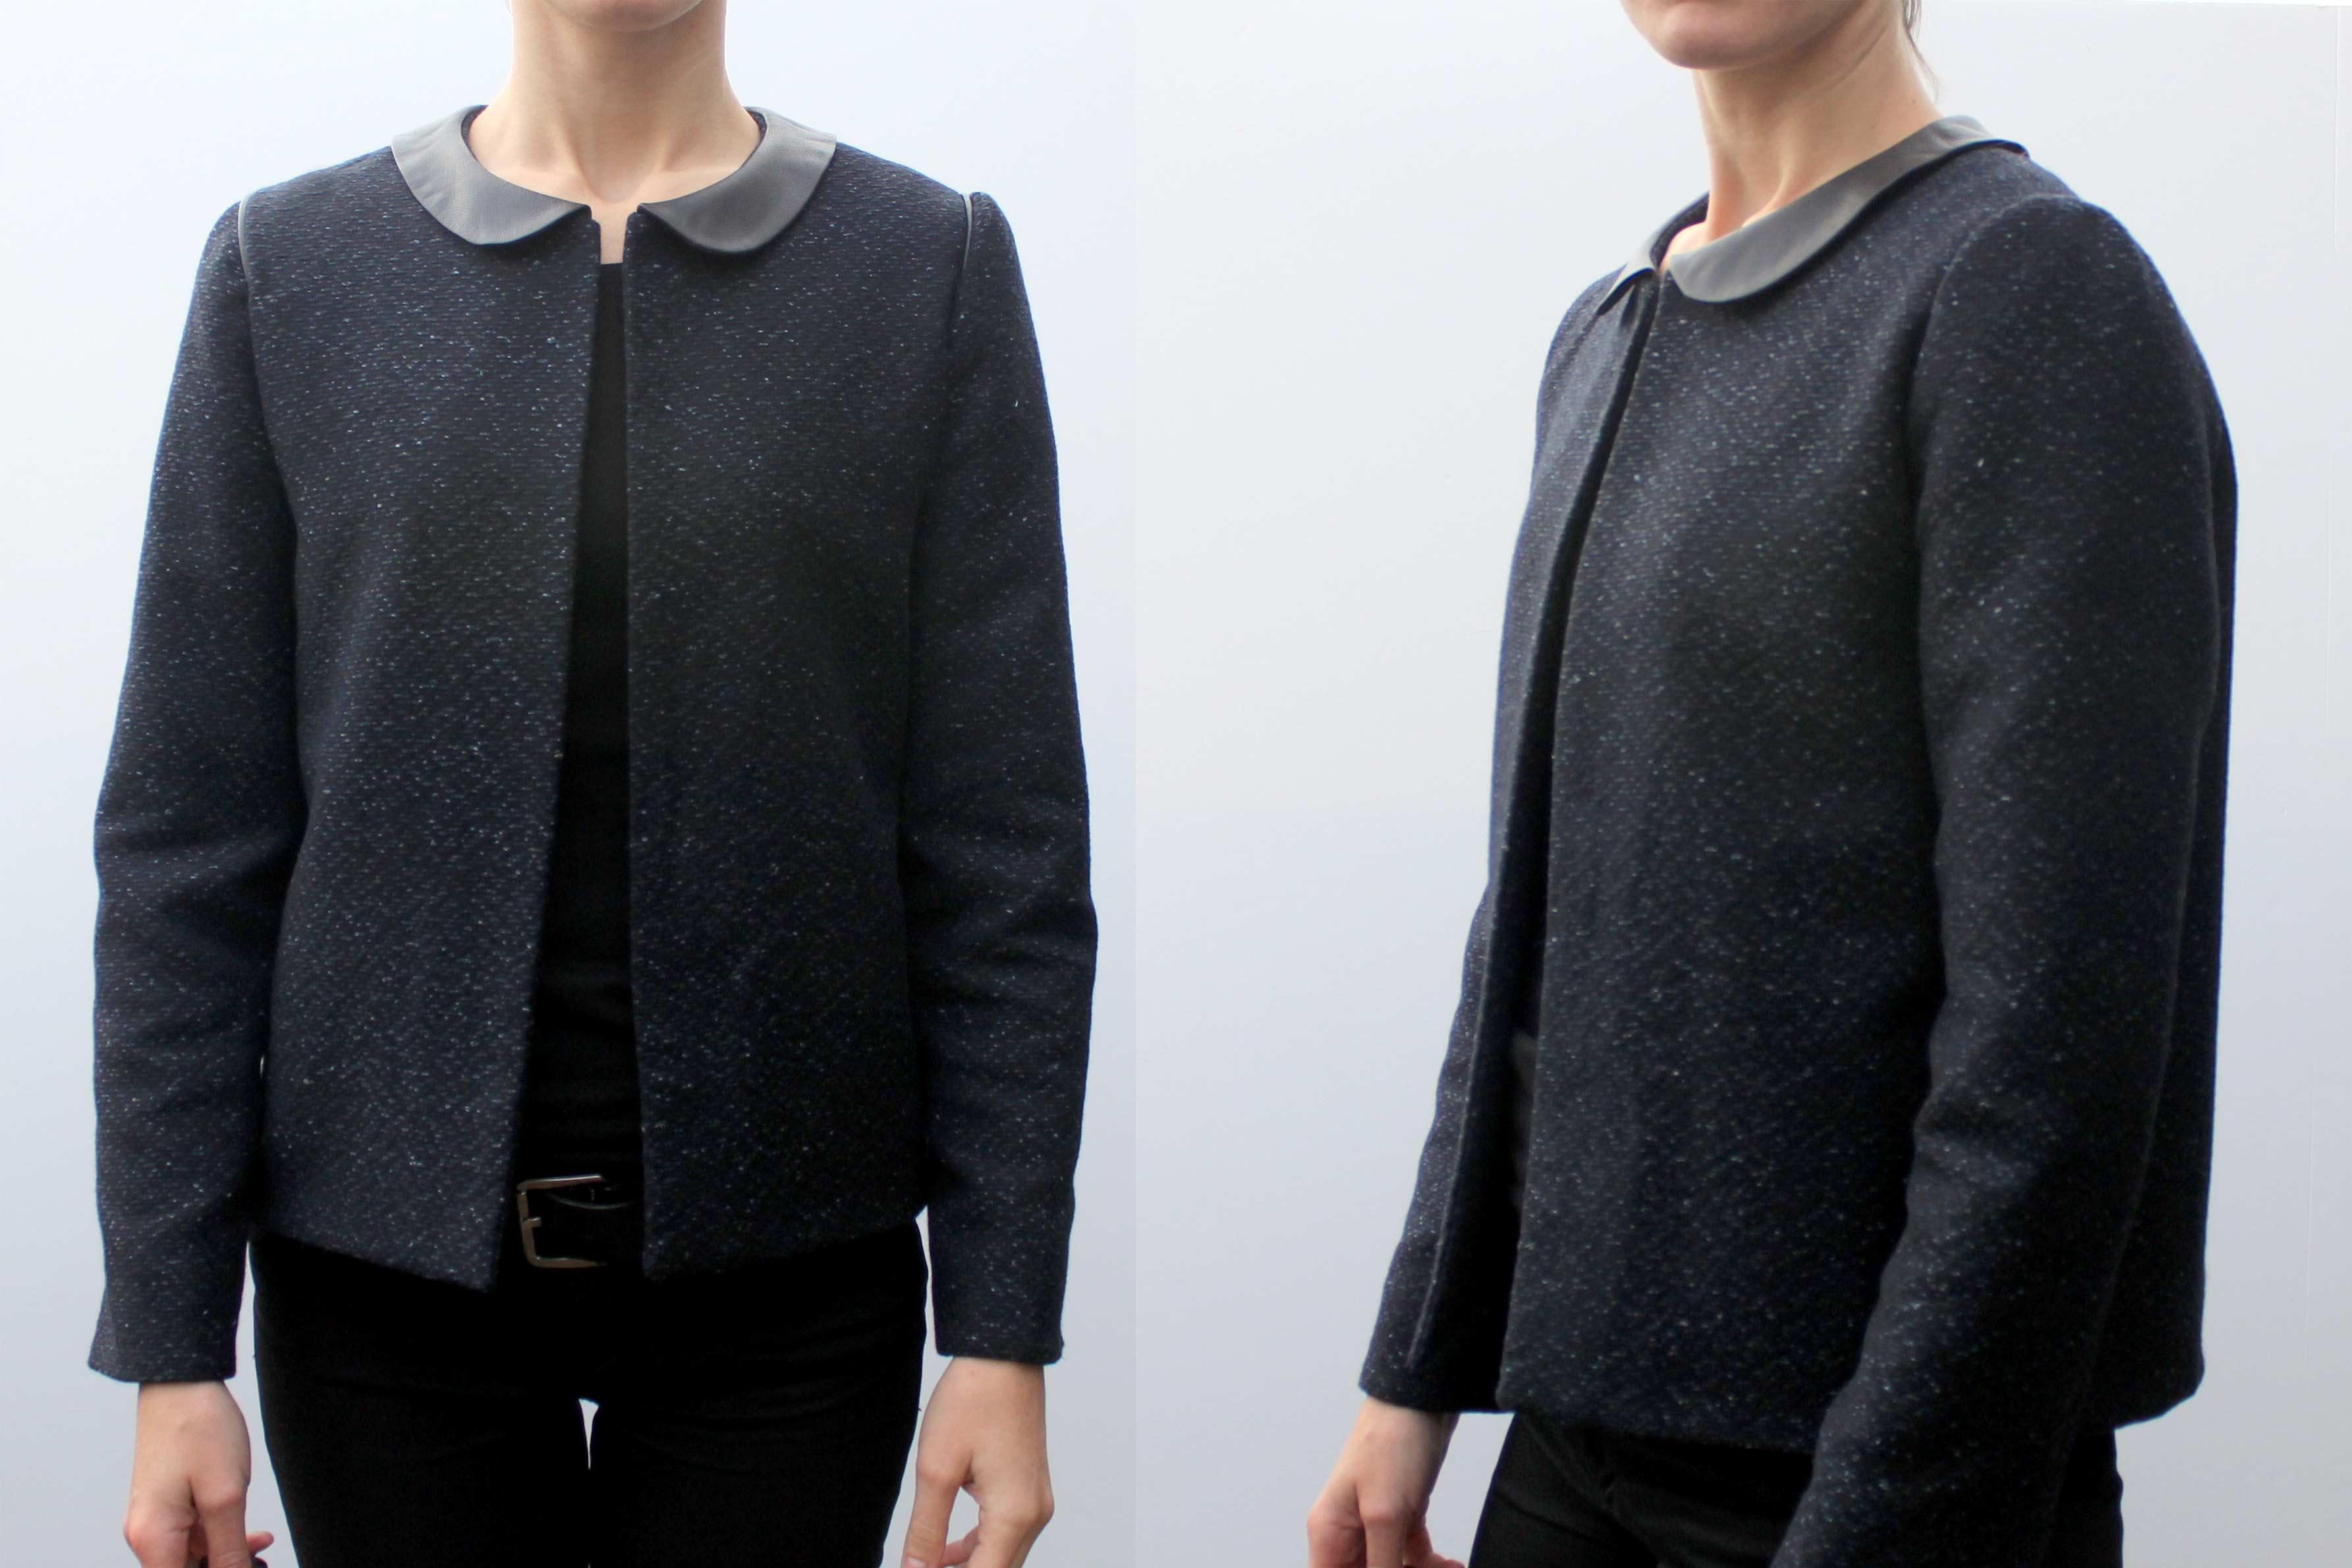 Gut bekannt couture veste femme UF37